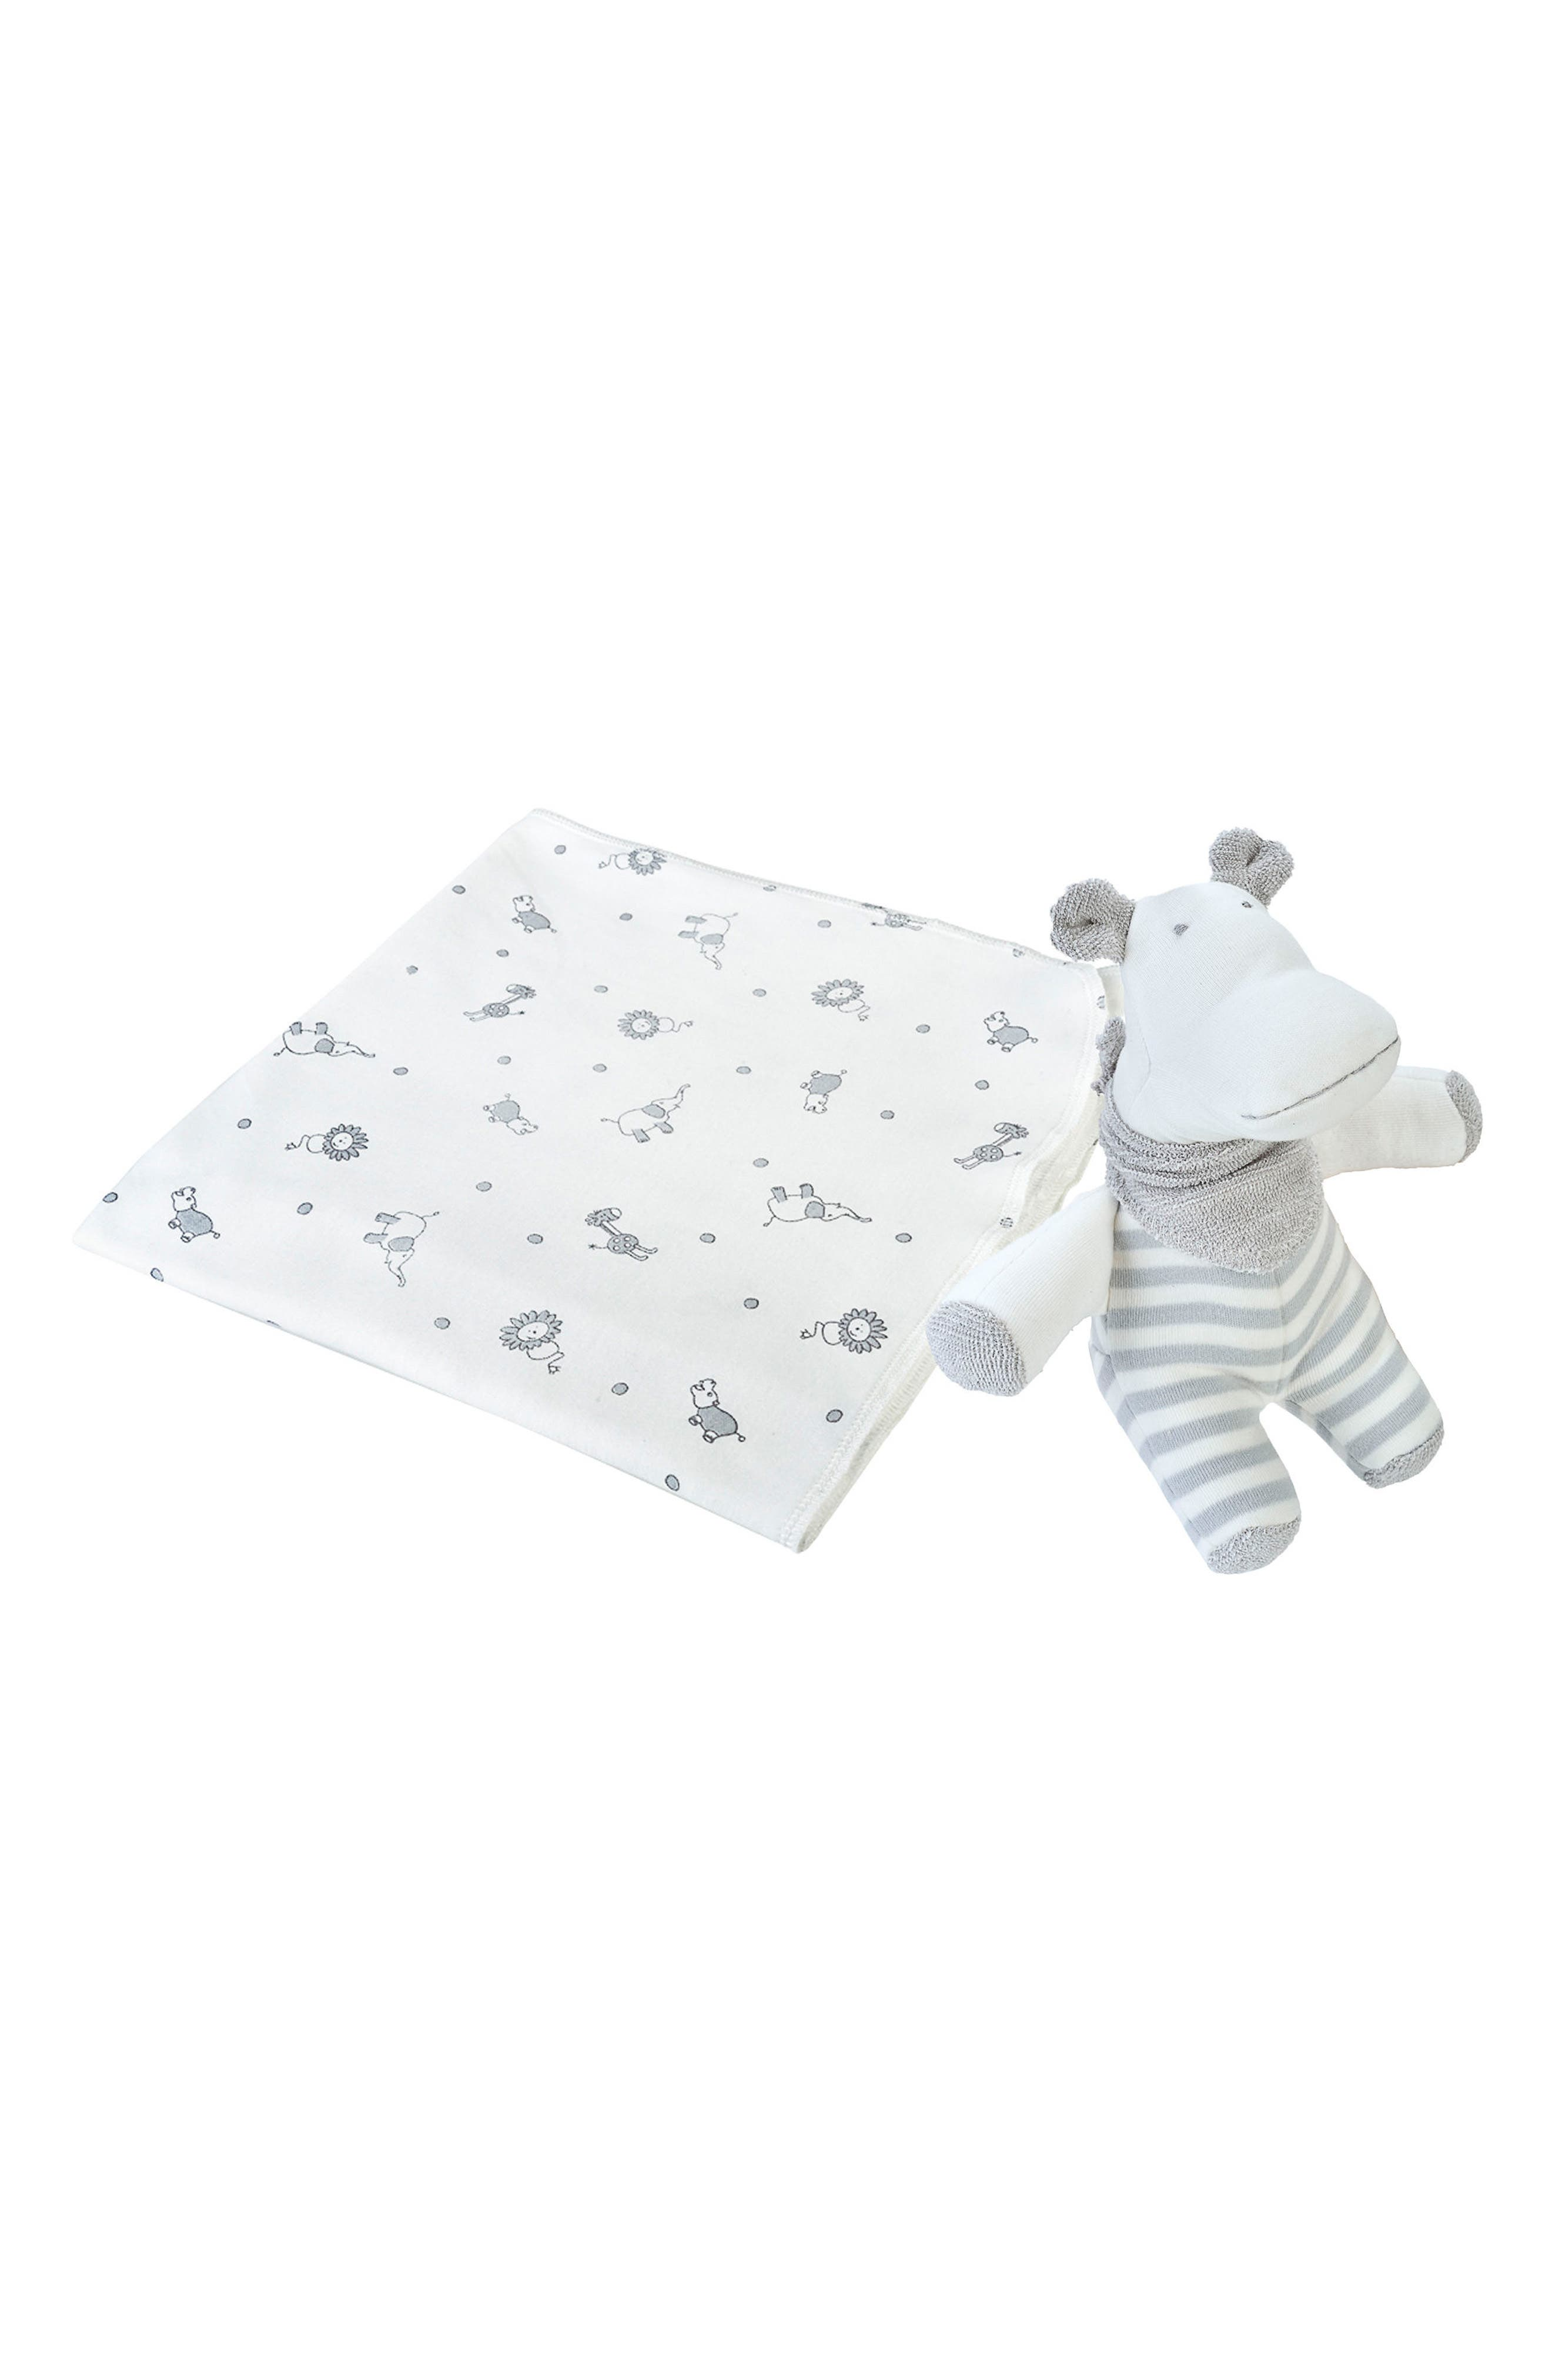 2-Piece Jungle Print Swaddle Blanket & Stuffed Animal Set,                         Main,                         color, 020